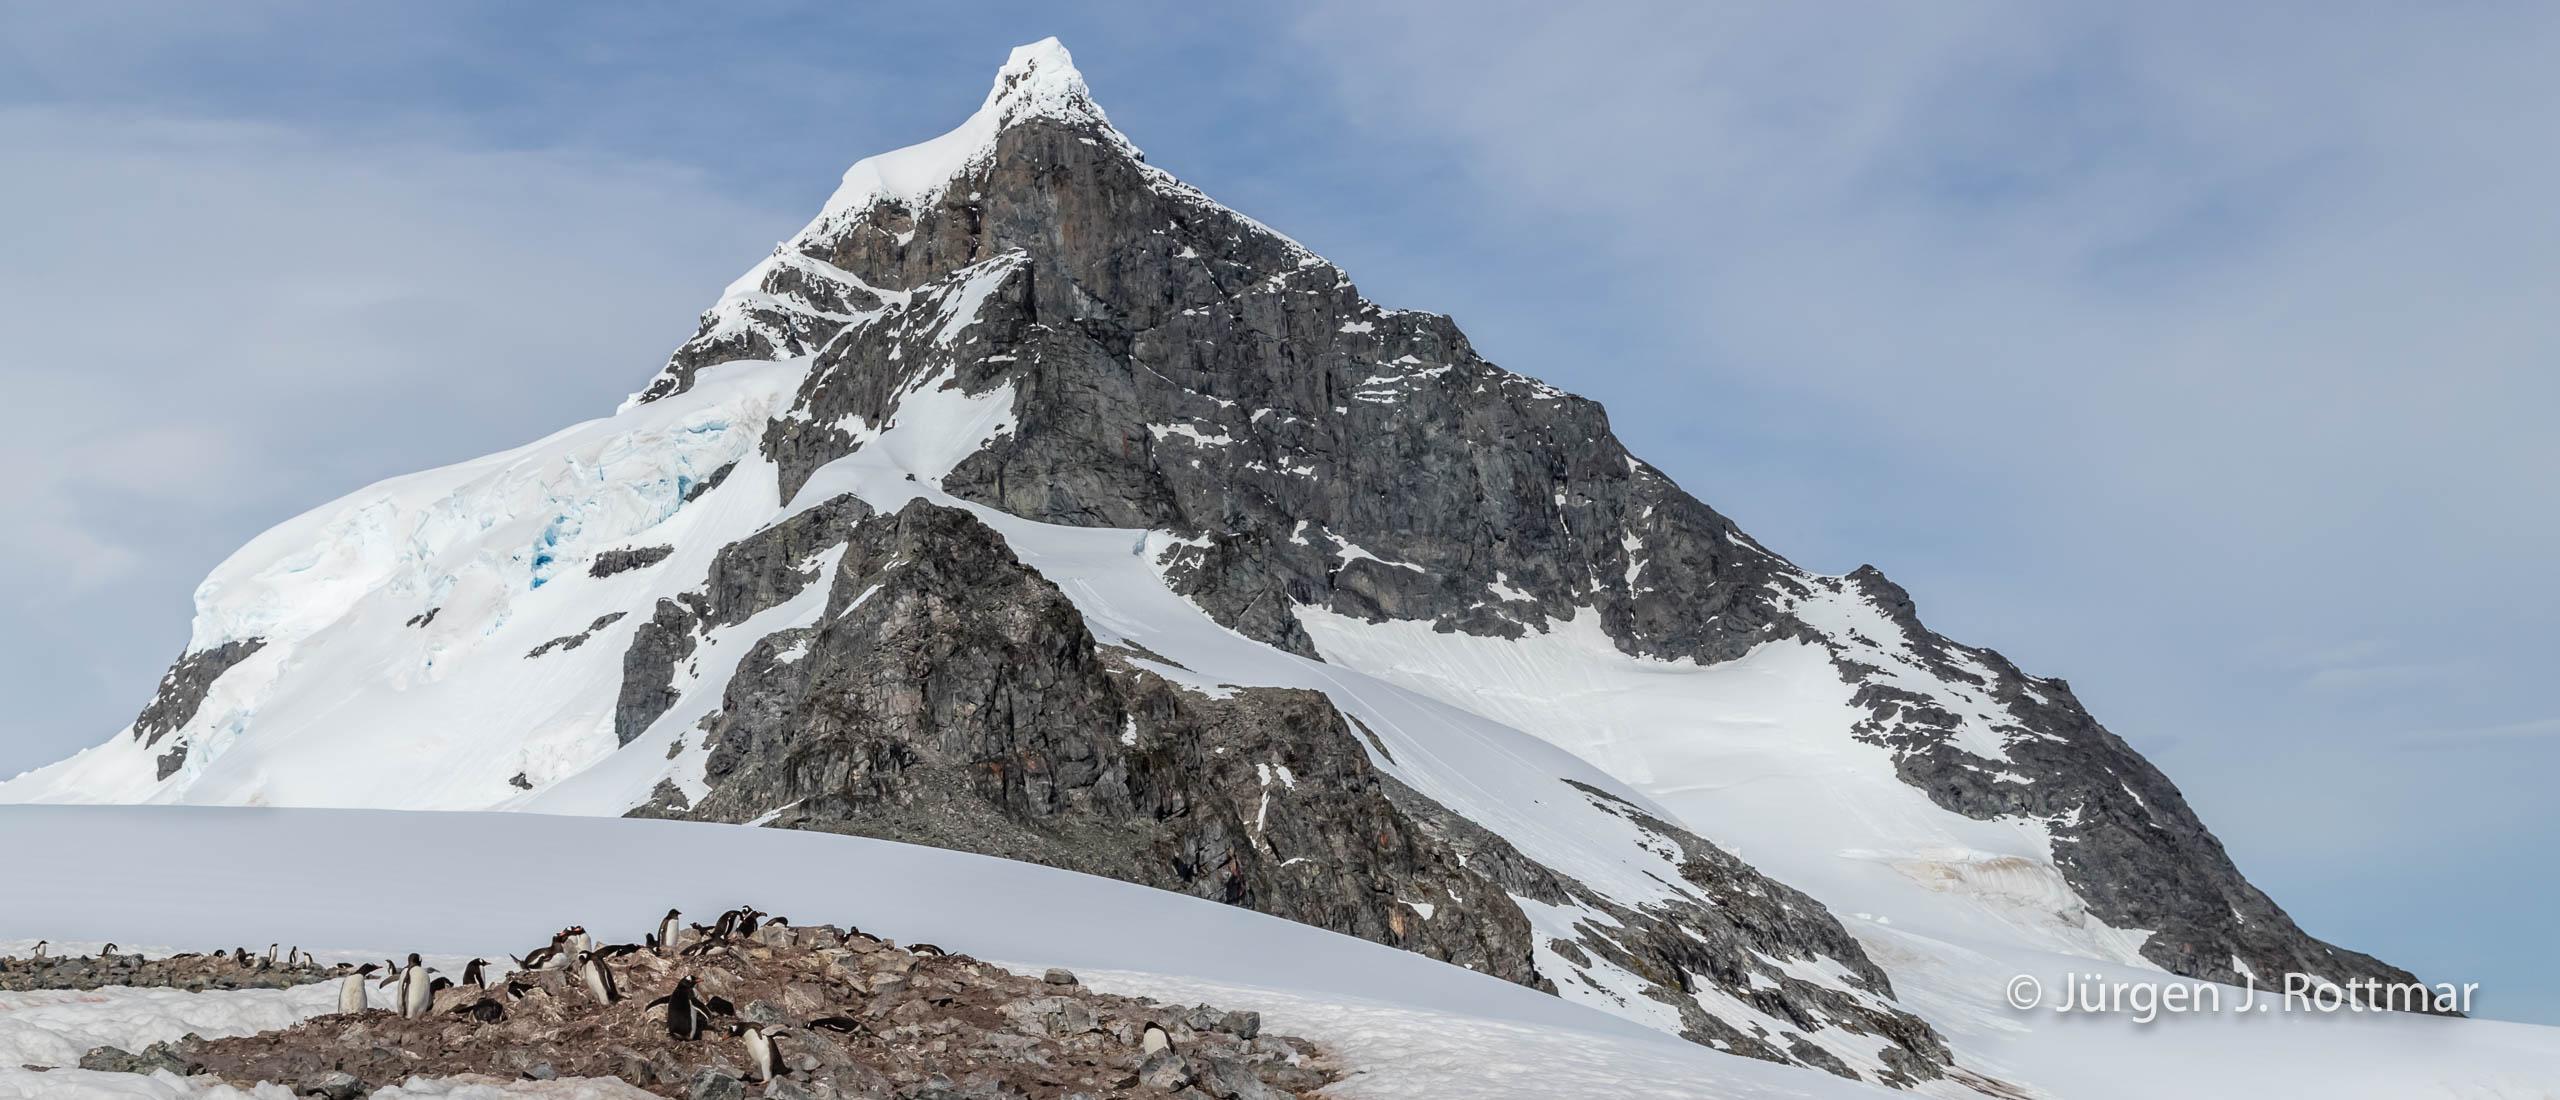 Juergen J Rottmar Antarctica M2I1156 Bearbeitet